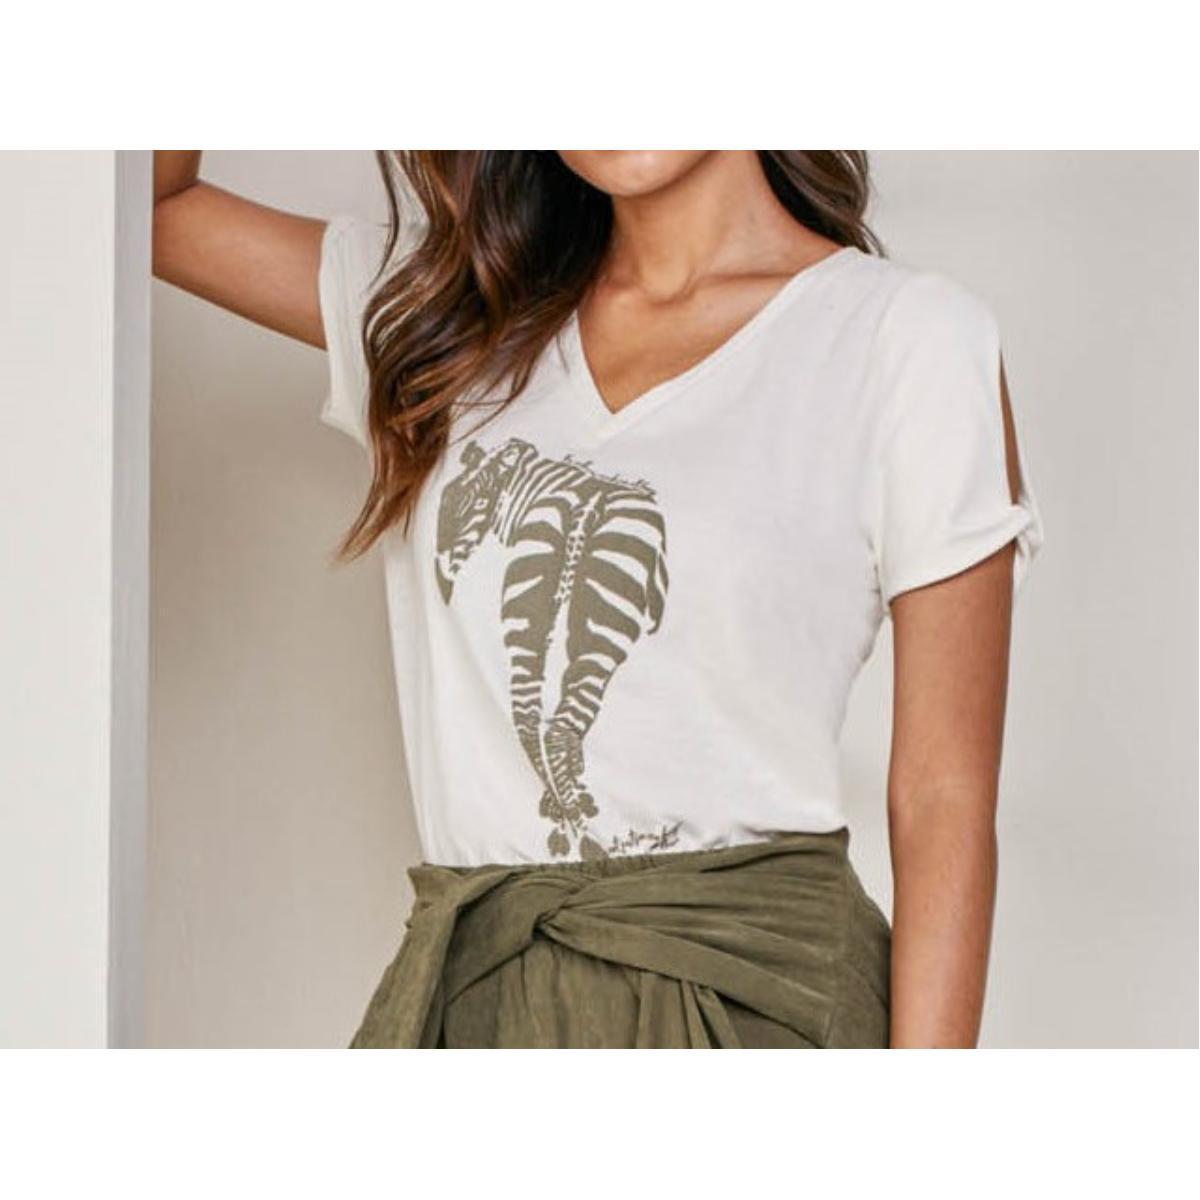 T-shirt Feminino Lado Avesso L115411 Zebra